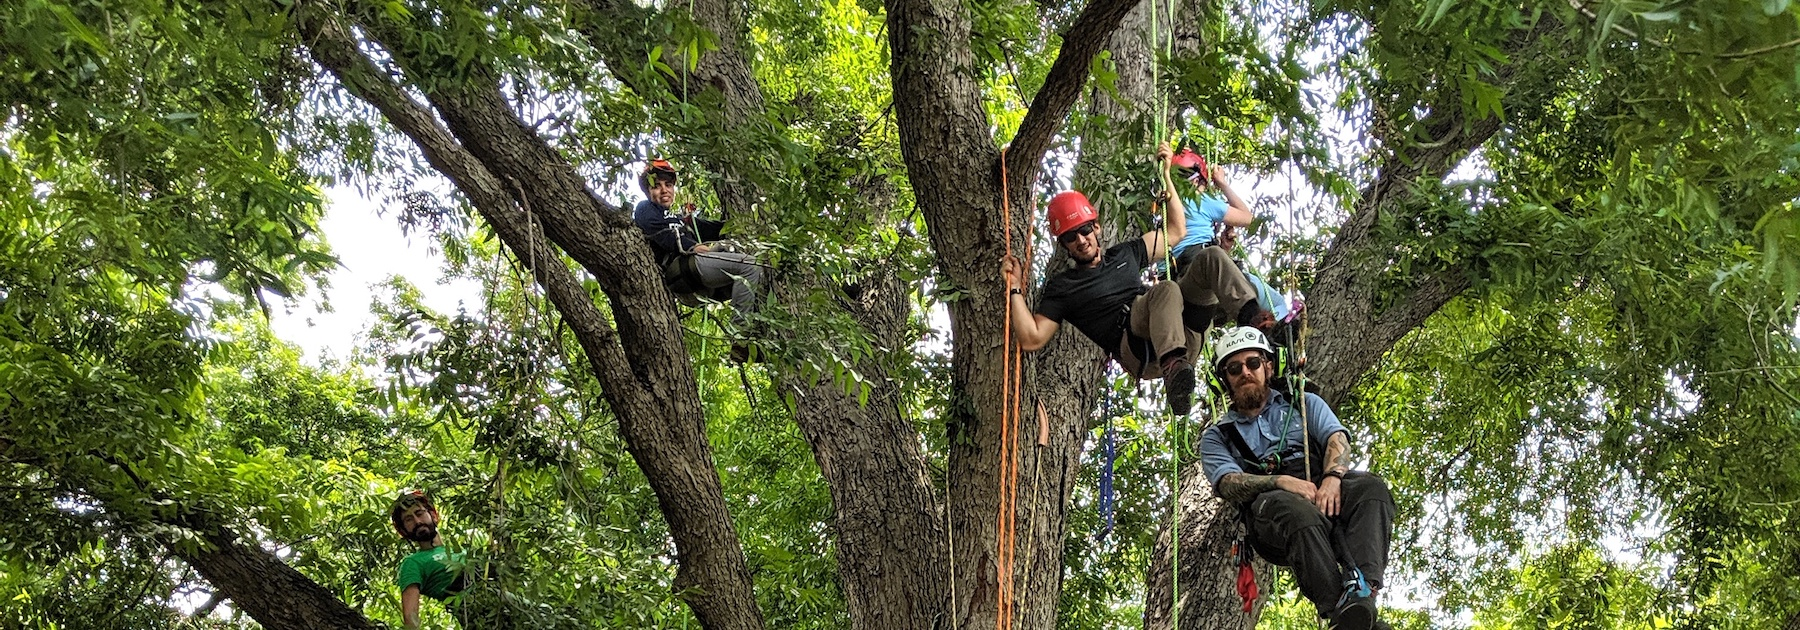 People Climbing Tree